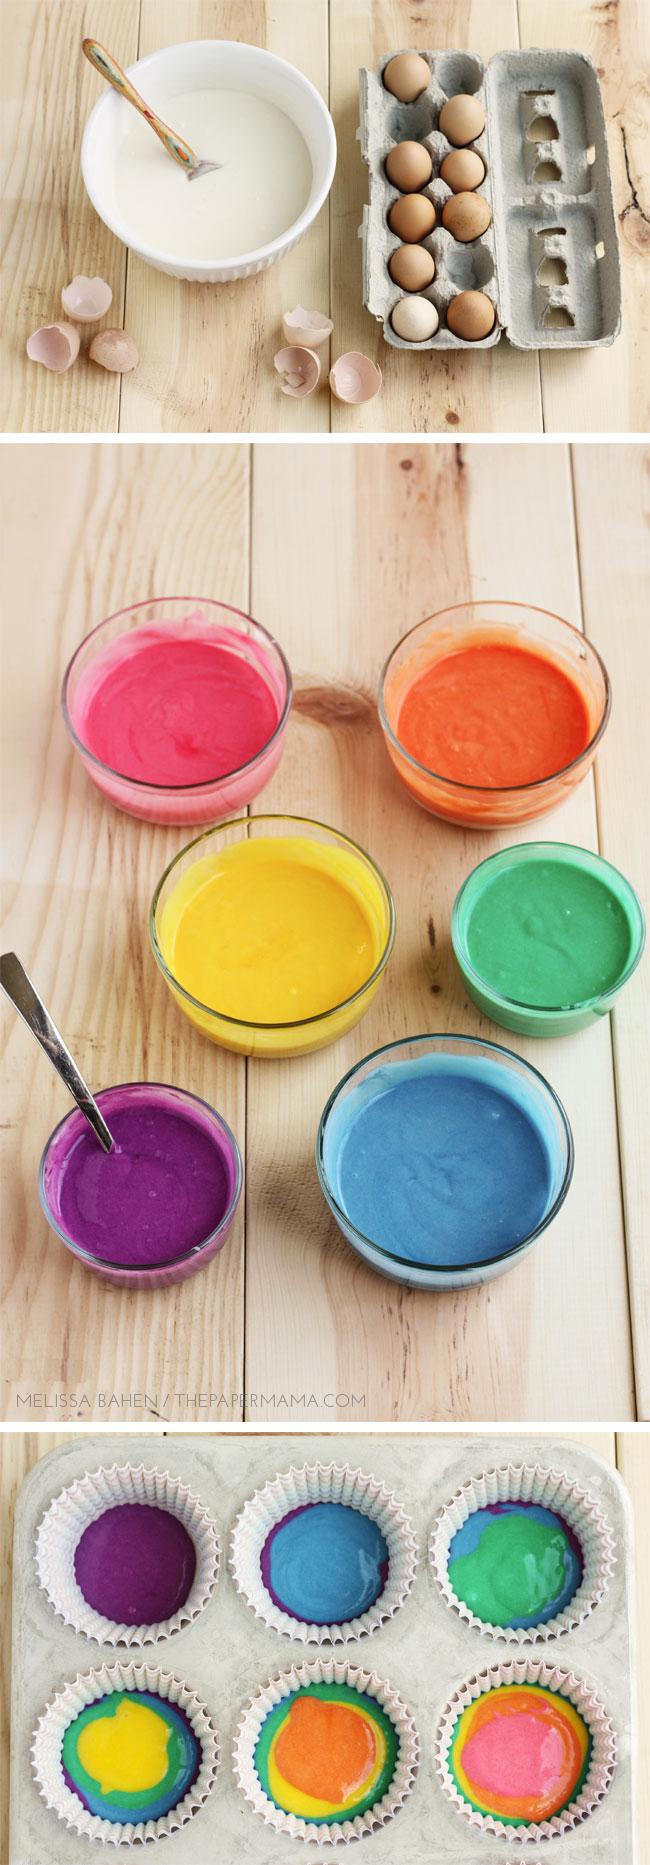 Rainbow Cupcake Recipe and Rainbow Cupcake Topper Printables // Lulu the Baker for thepapermama.com